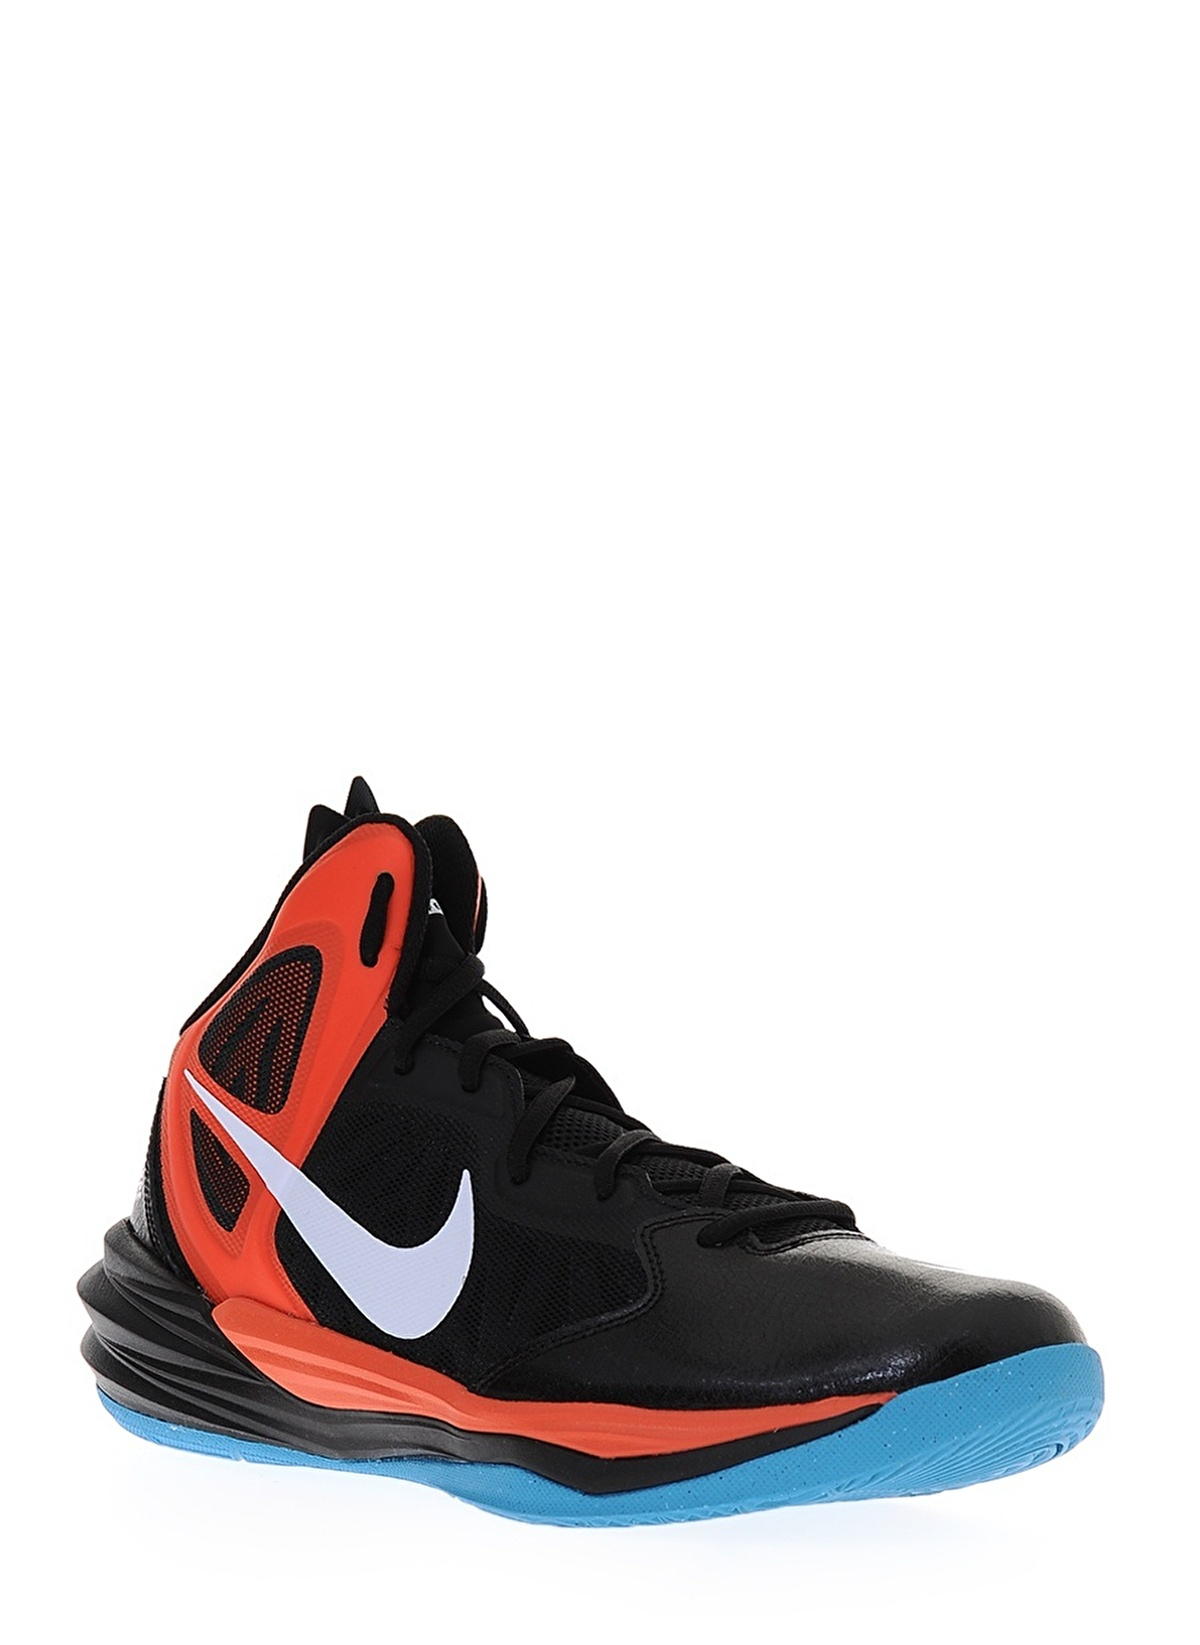 new product ca535 0a3de 683705-004-Nike-Prime-Hype-Df